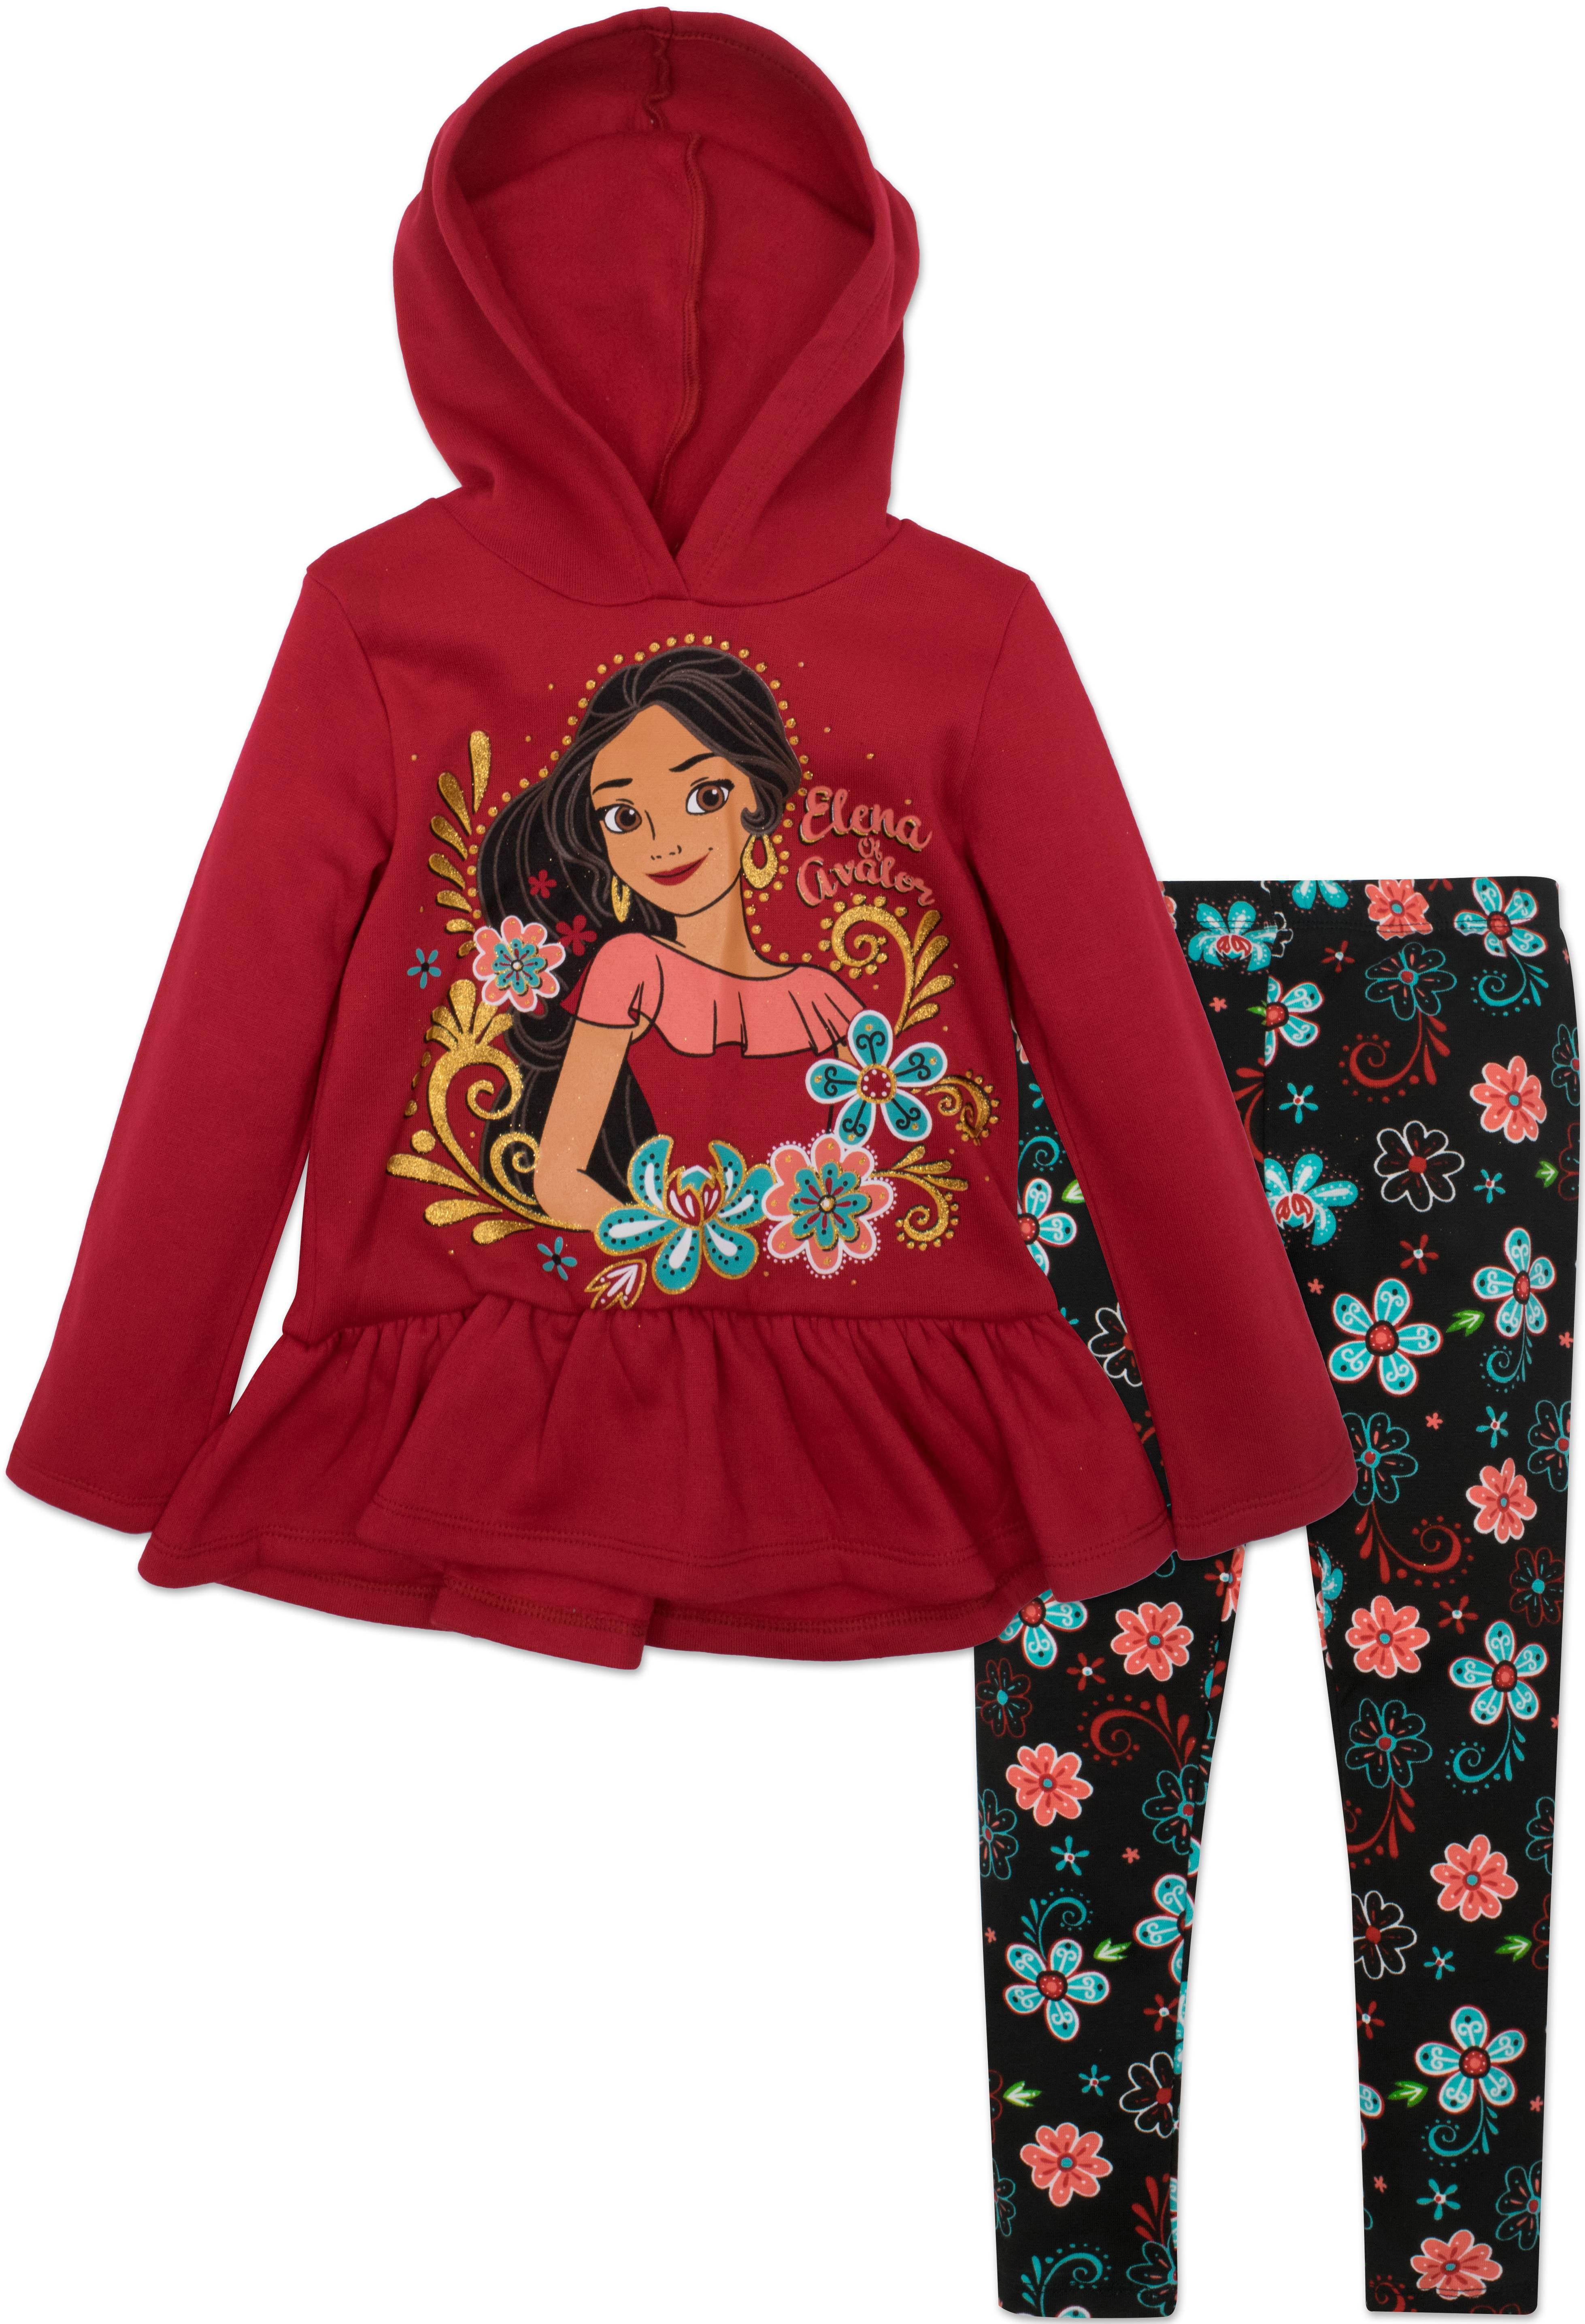 Disney Girls Toddler 2 Piece Elena of Avalor Sweatshirt Set